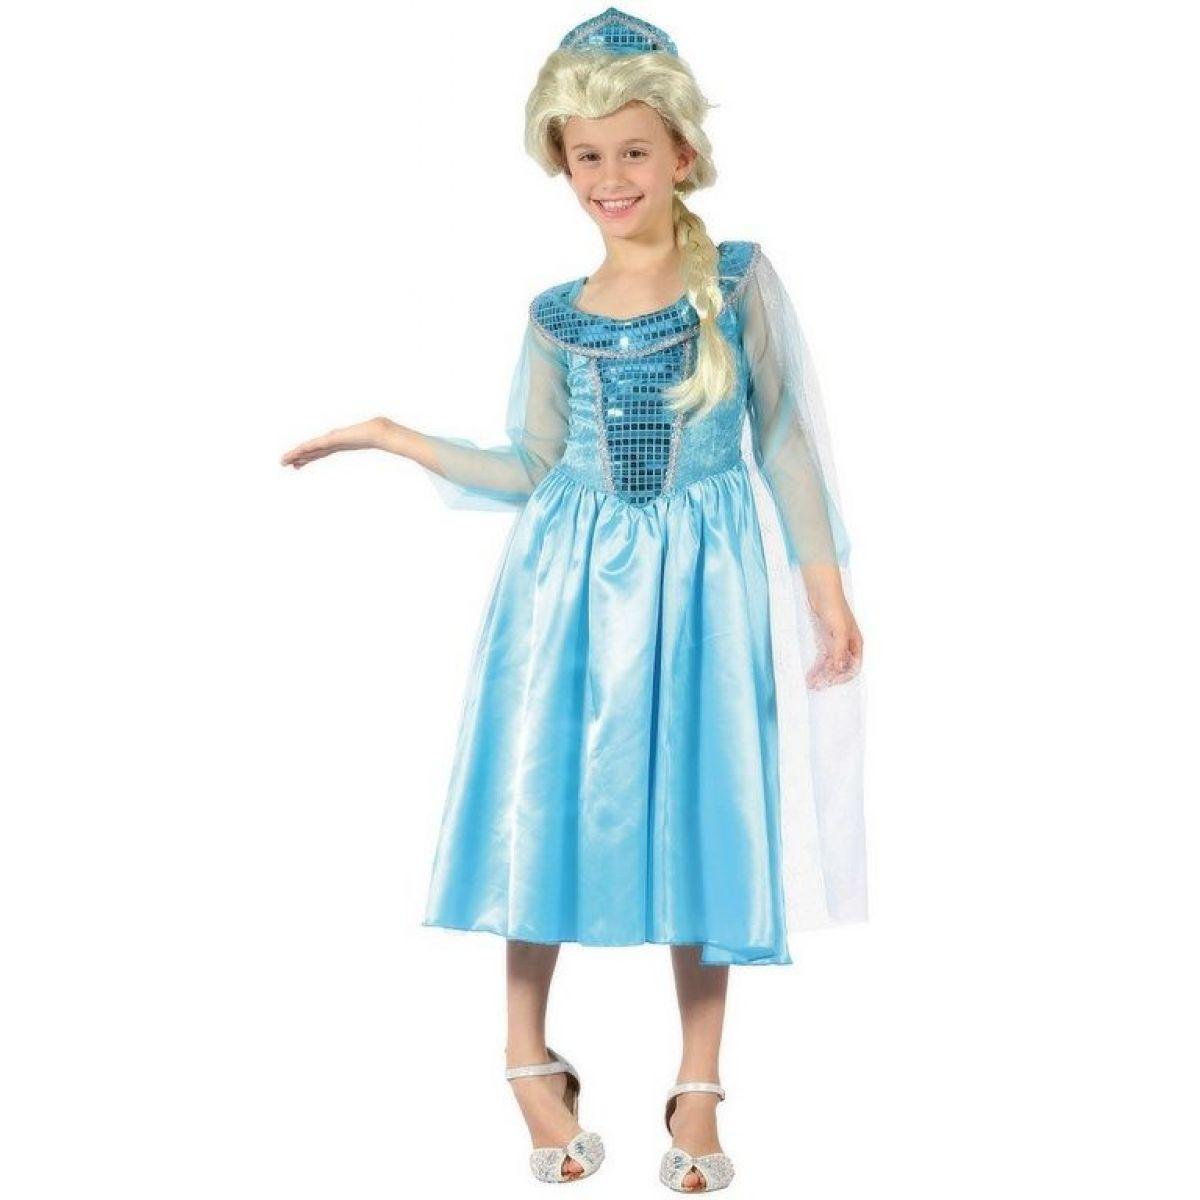 Made Dětský karnevalový kostým Ledová princezna 120 -130 cm